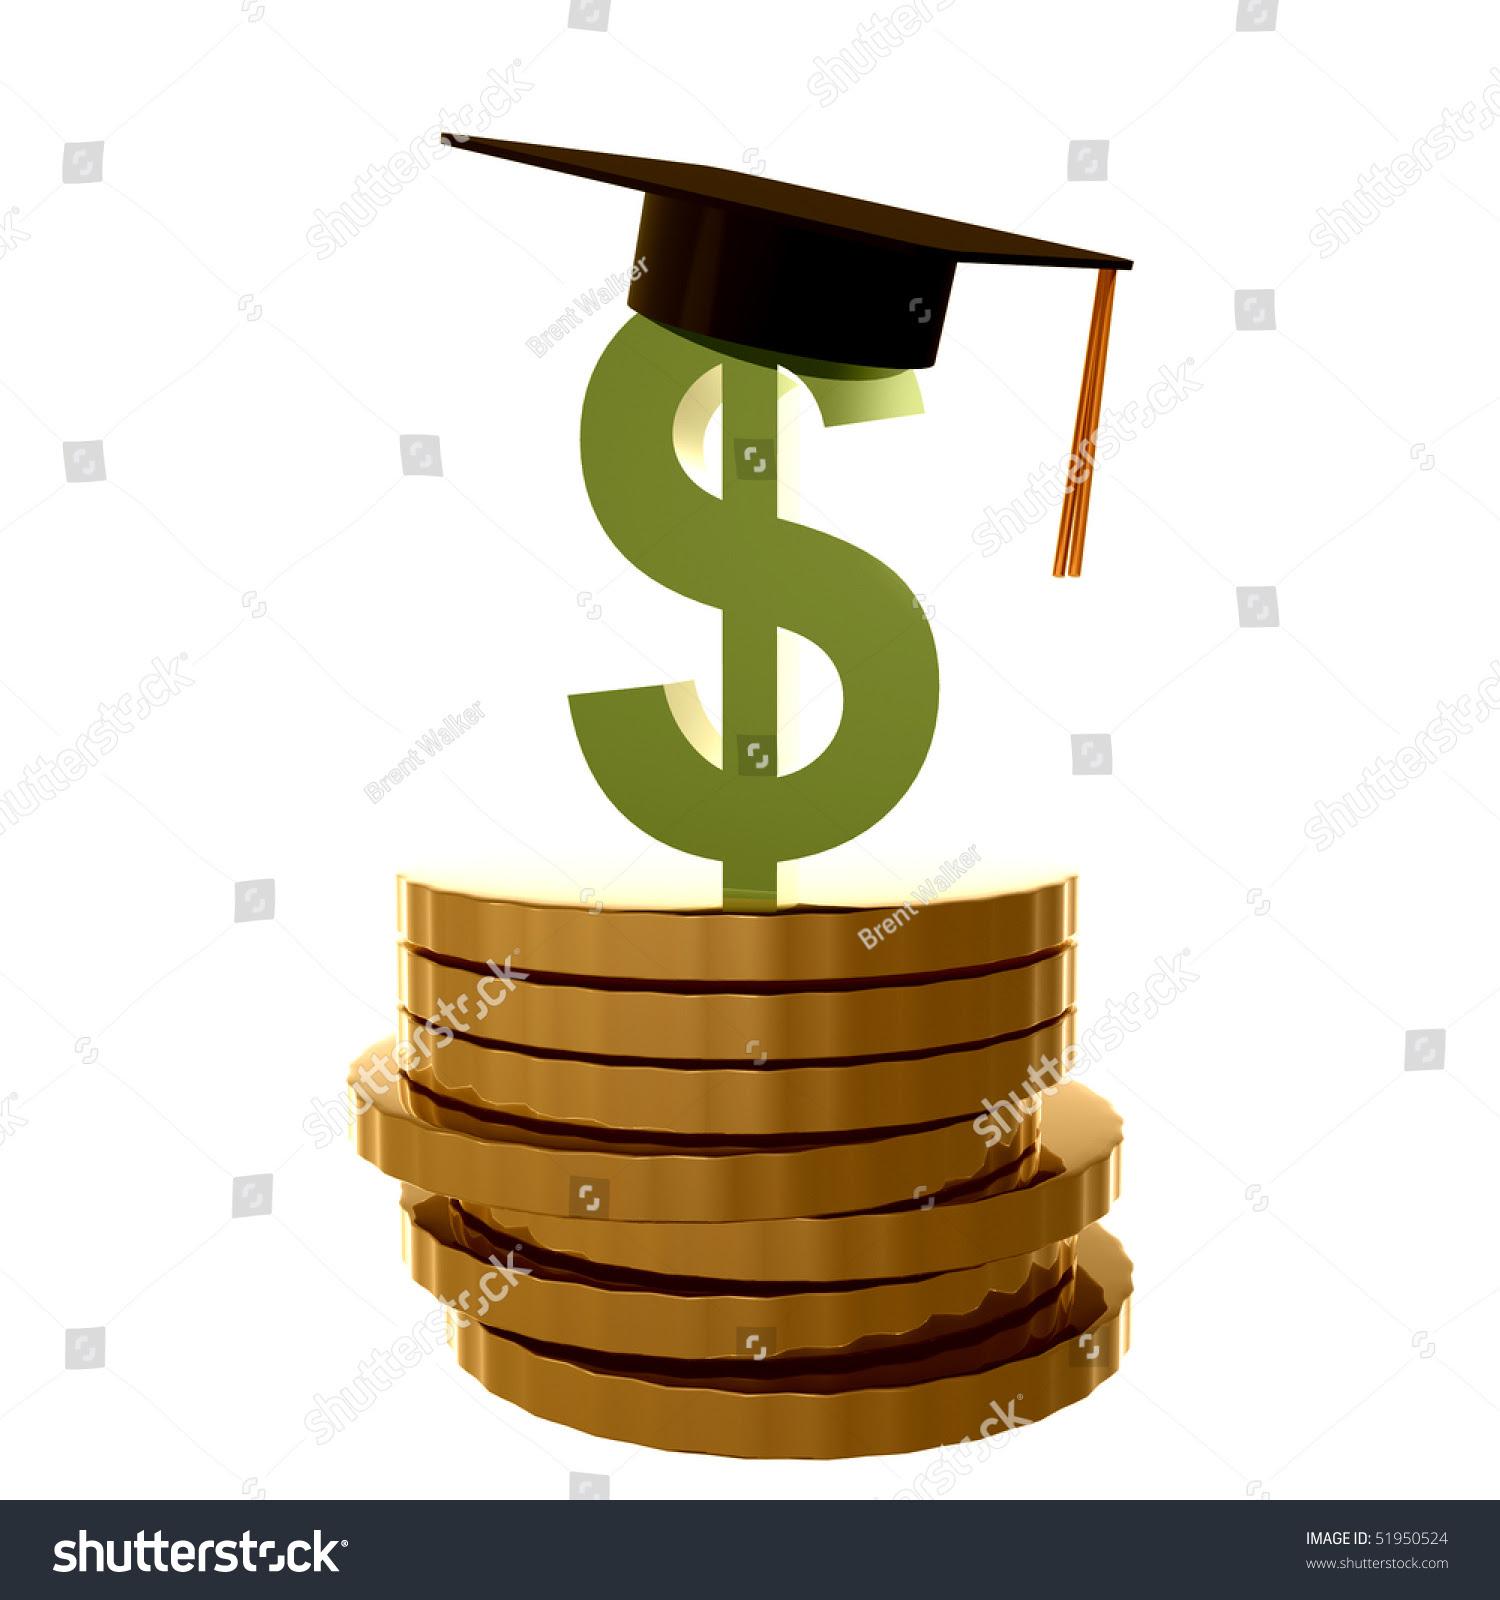 Scholarship Fund Icon Symbol Illustration - 51950524 ...